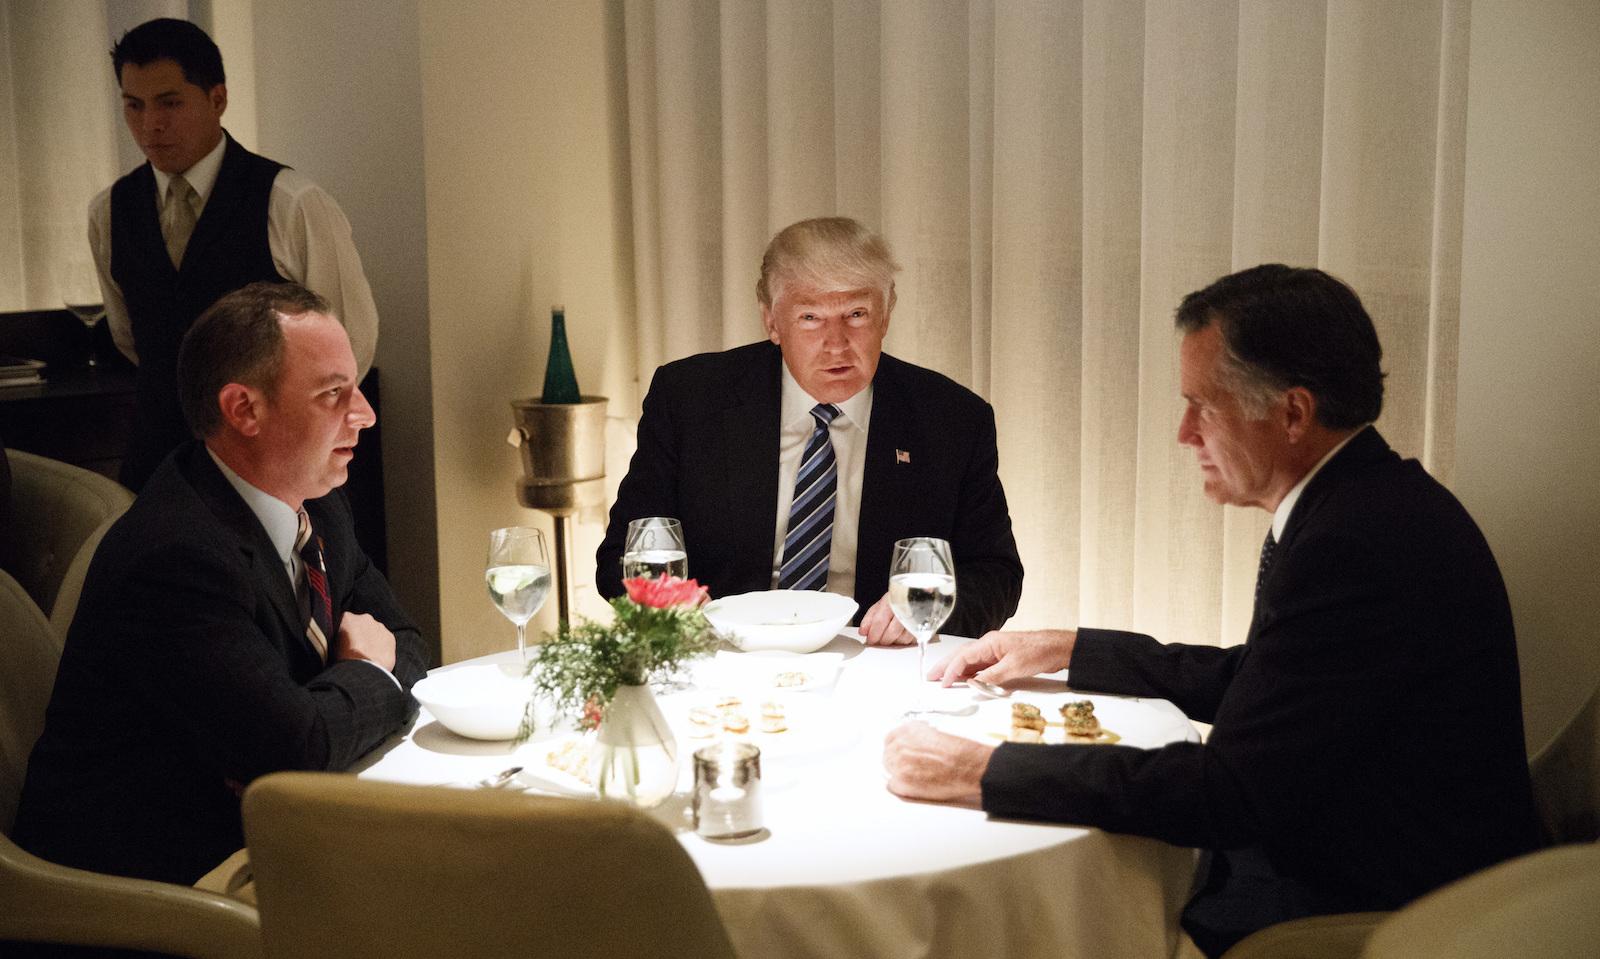 Donald Trump,Mitt Romney,Reince Priebus eat dinner at Jean Georges